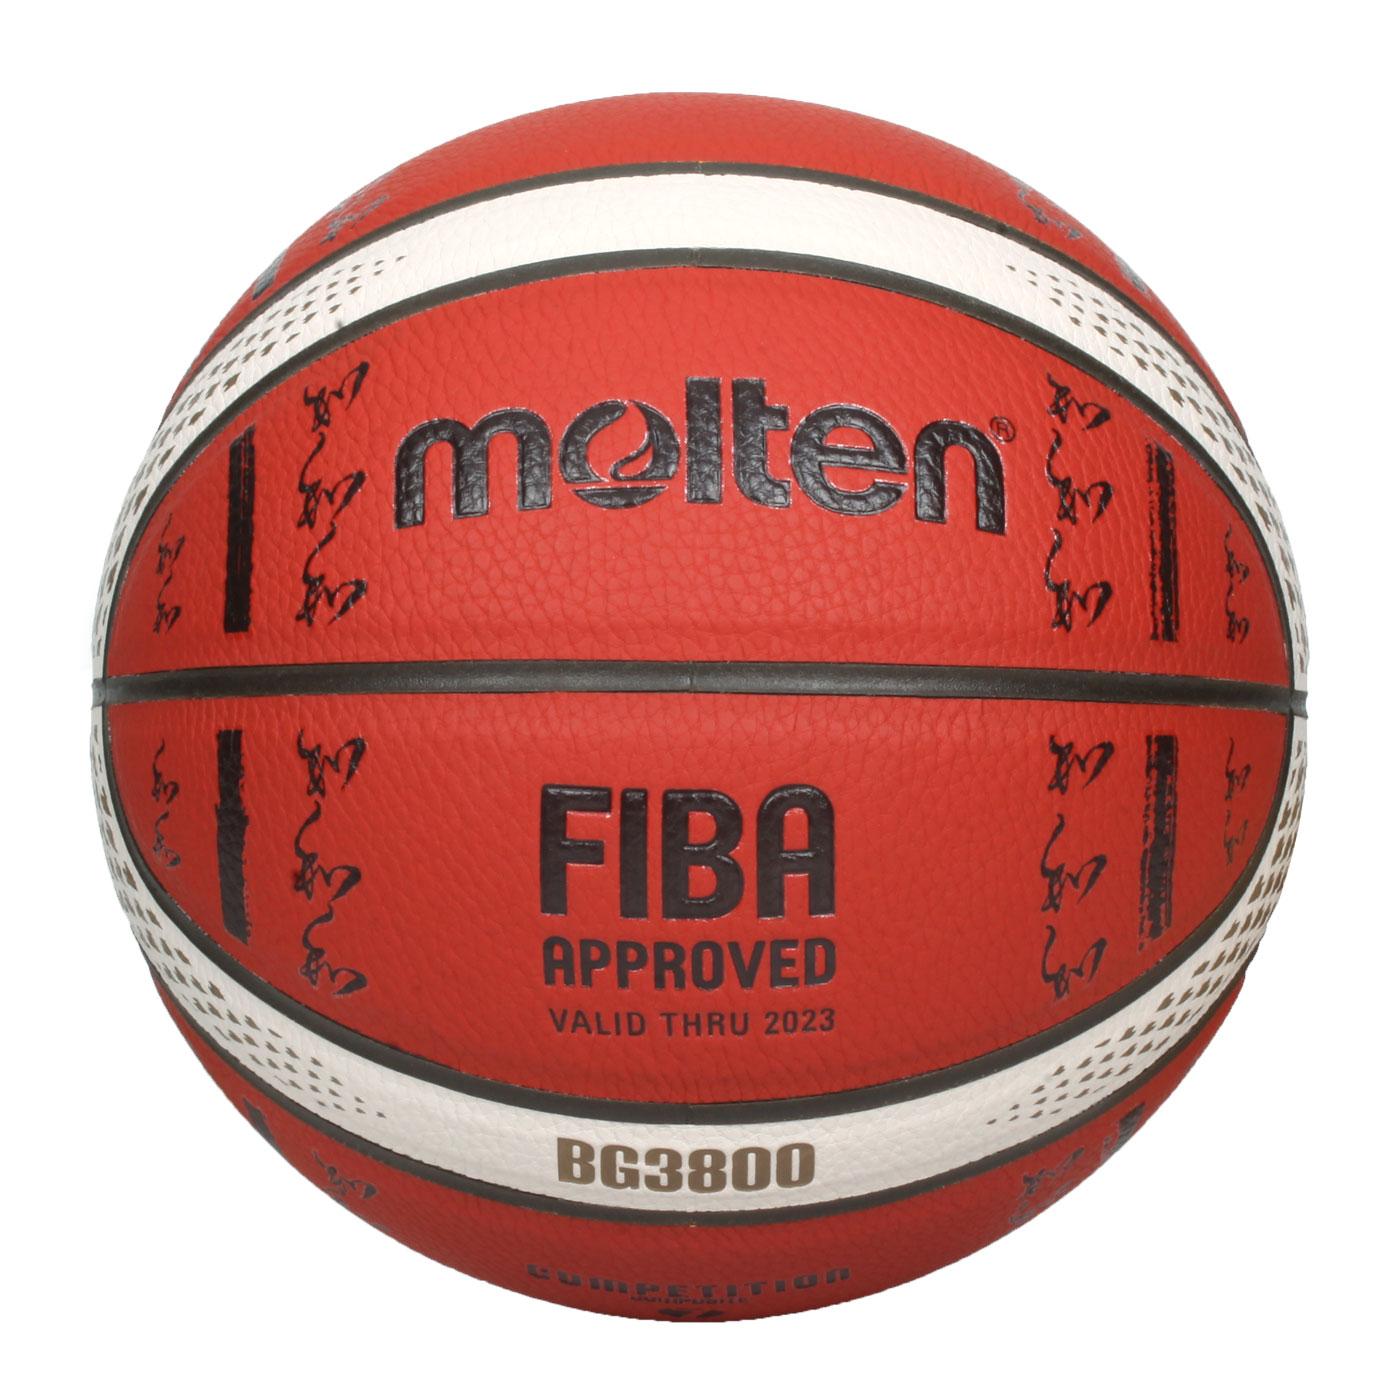 Molten #7合成皮12片貼籃球(2020奧運紀念球款) B7G3800-SOJ - 橘米白黑